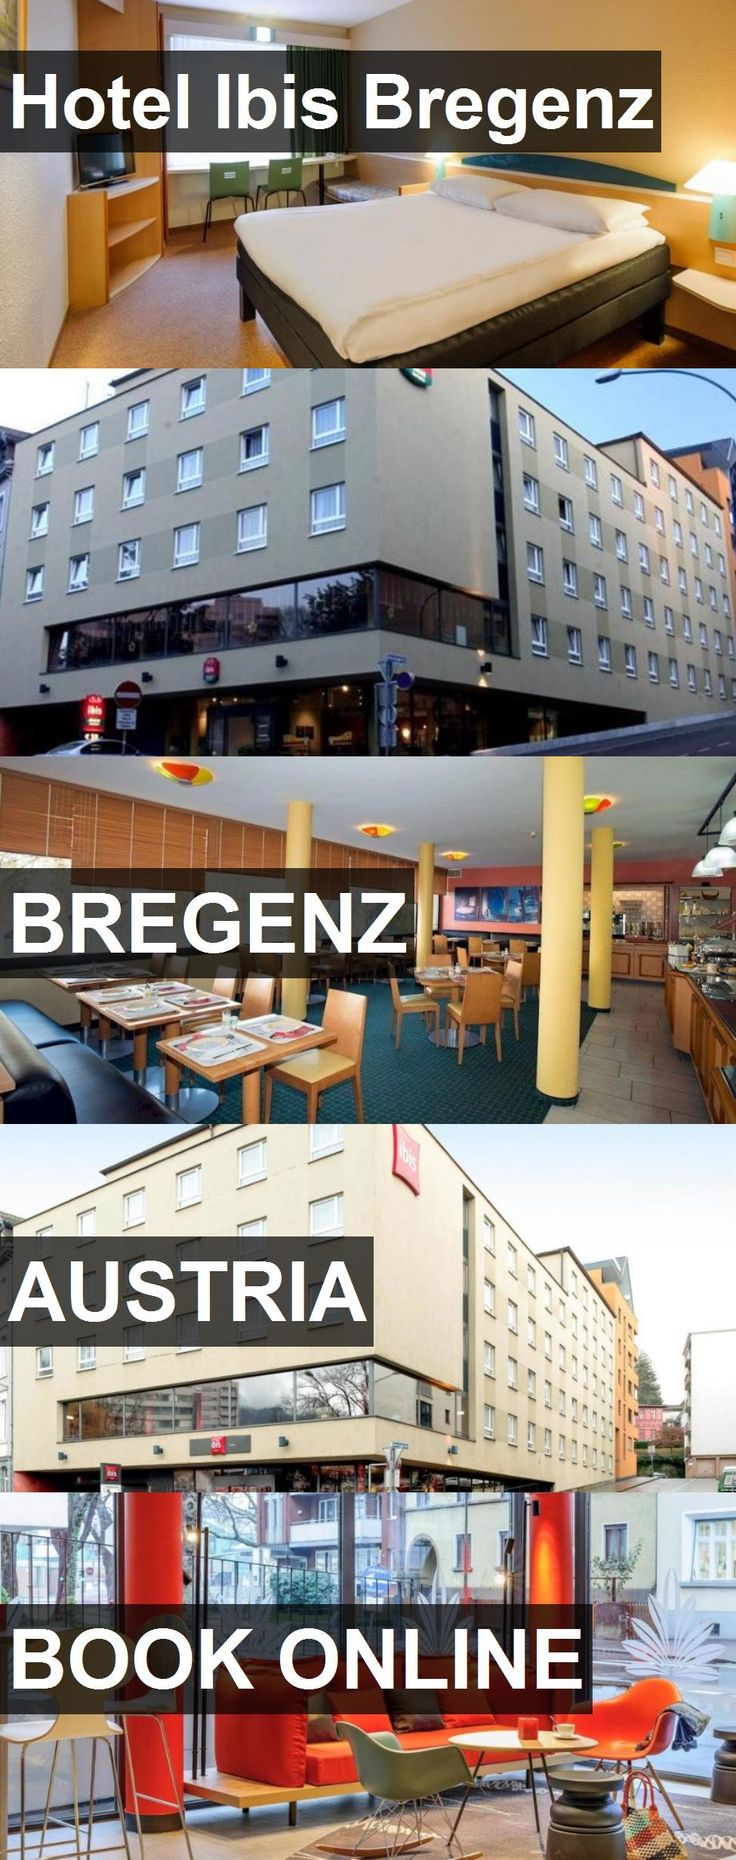 Hotel Ibis Bregenz in Bregenz, Austria. For more information, photos, reviews and best prices please follow the link. #Austria #Bregenz #travel #vacation #hotel